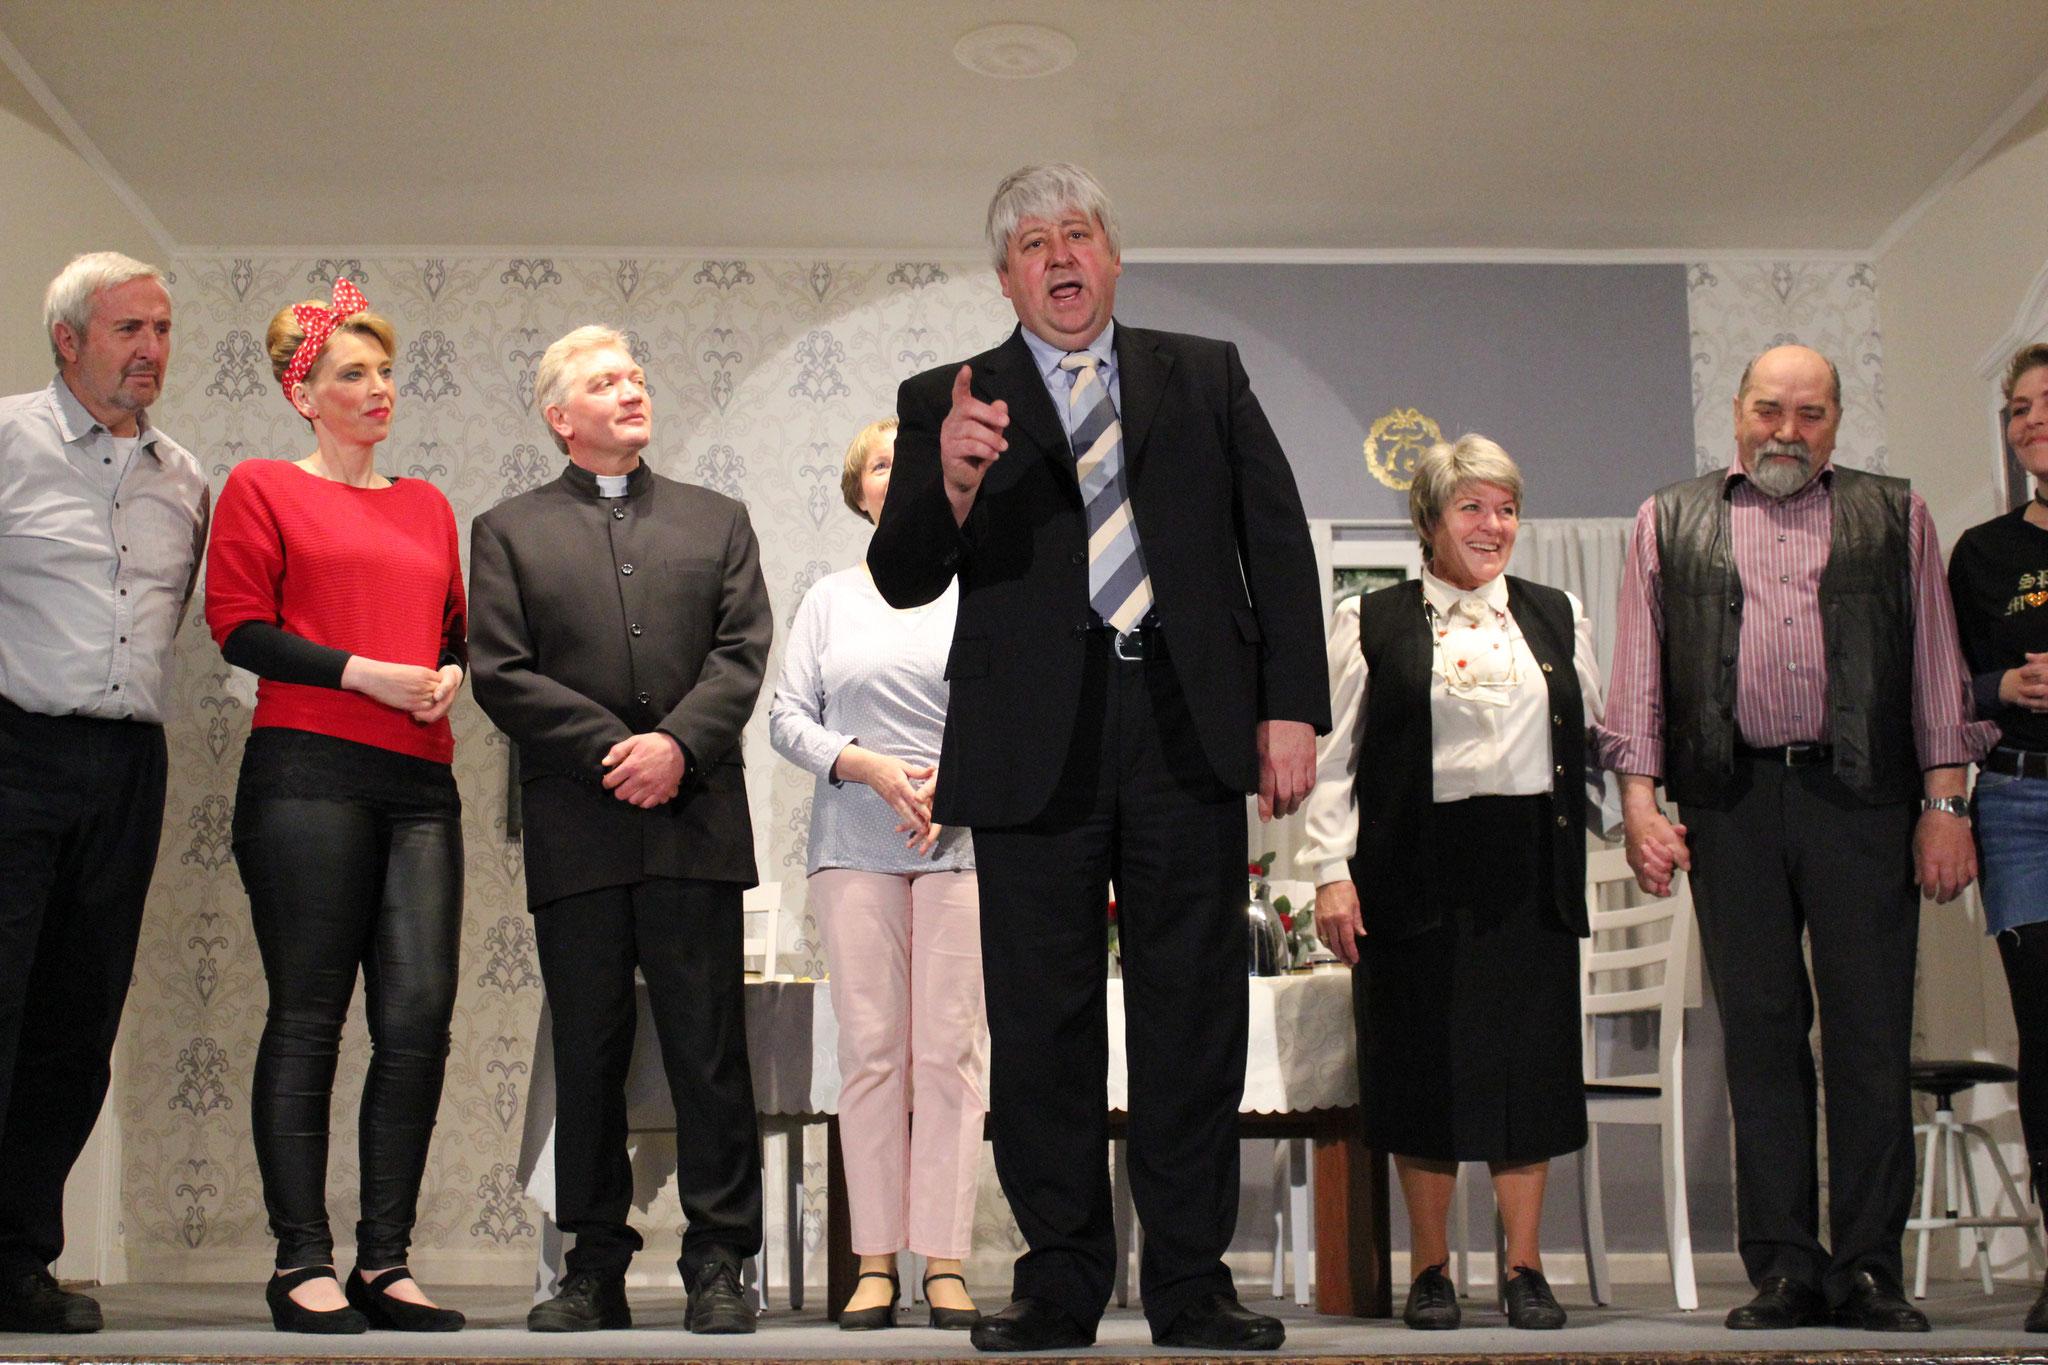 Wilke Visser, Silke Thomsen, jürgen Baasch, Silke Sommer, Torsten Mißfeldt, Lydia Türke, Jochen Besler, Sabrina Marwedel